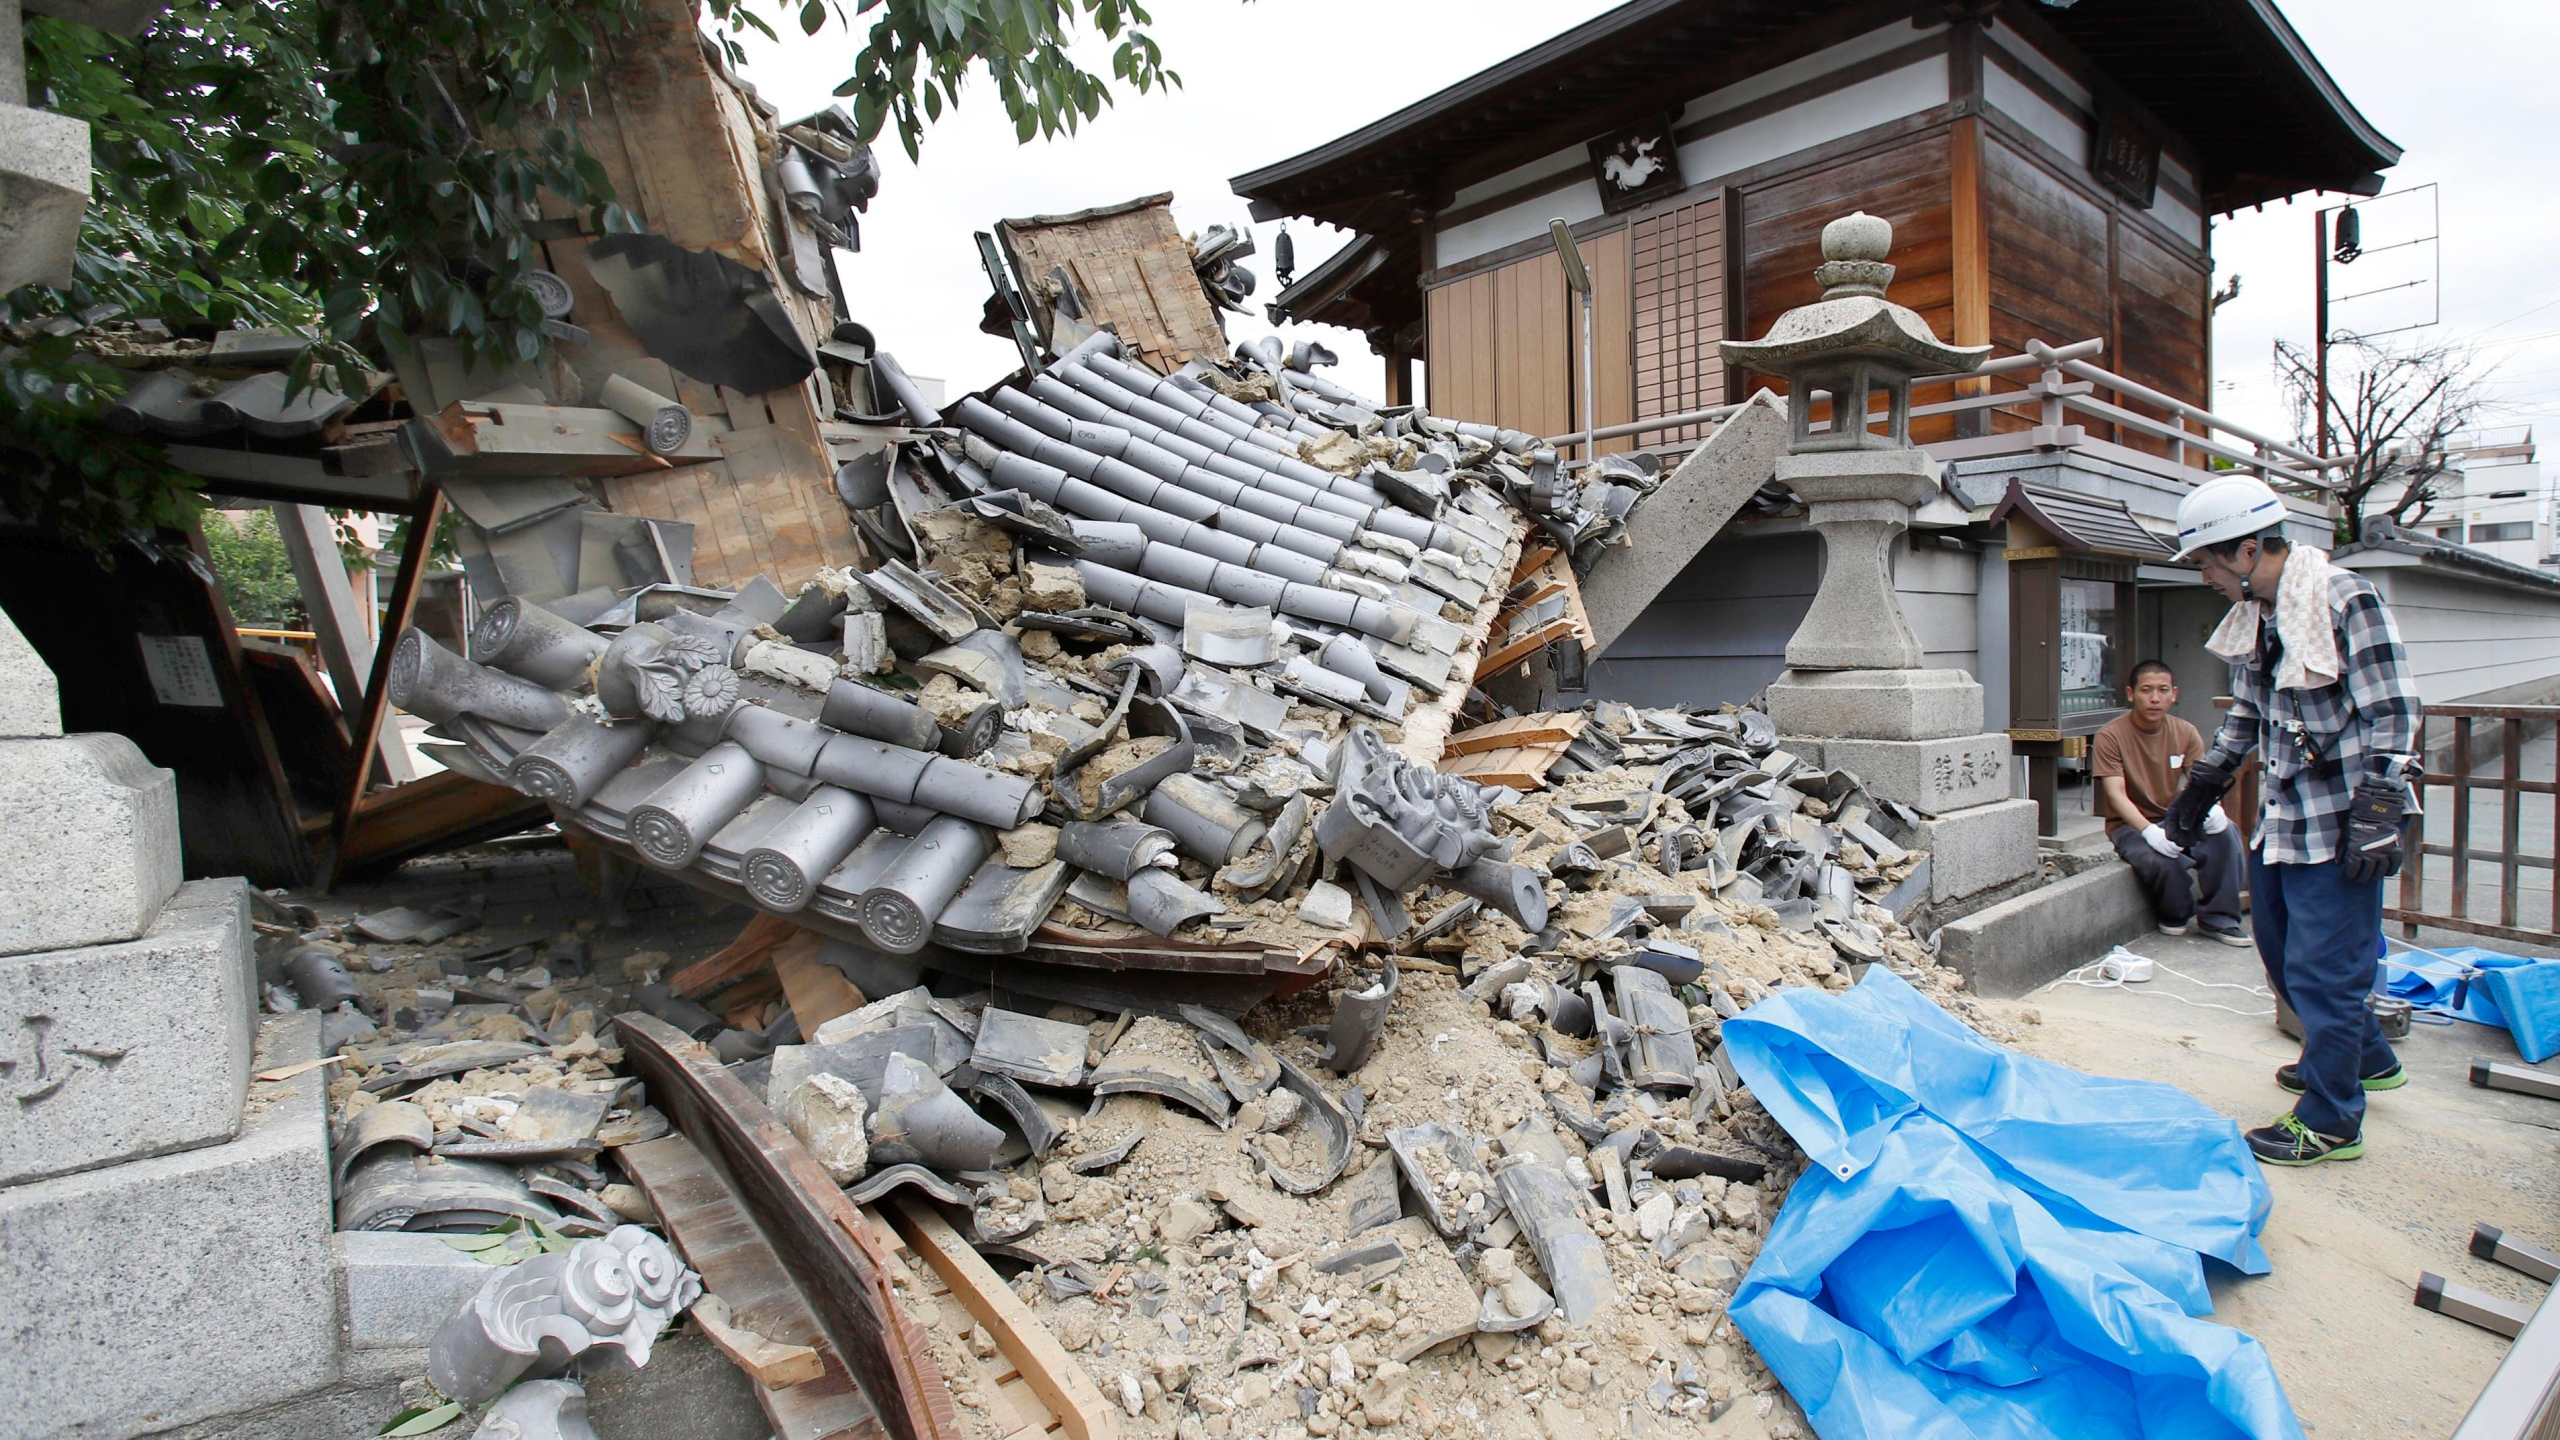 APTOPIX_Japan_Earthquake_86966-159532.jpg70059861